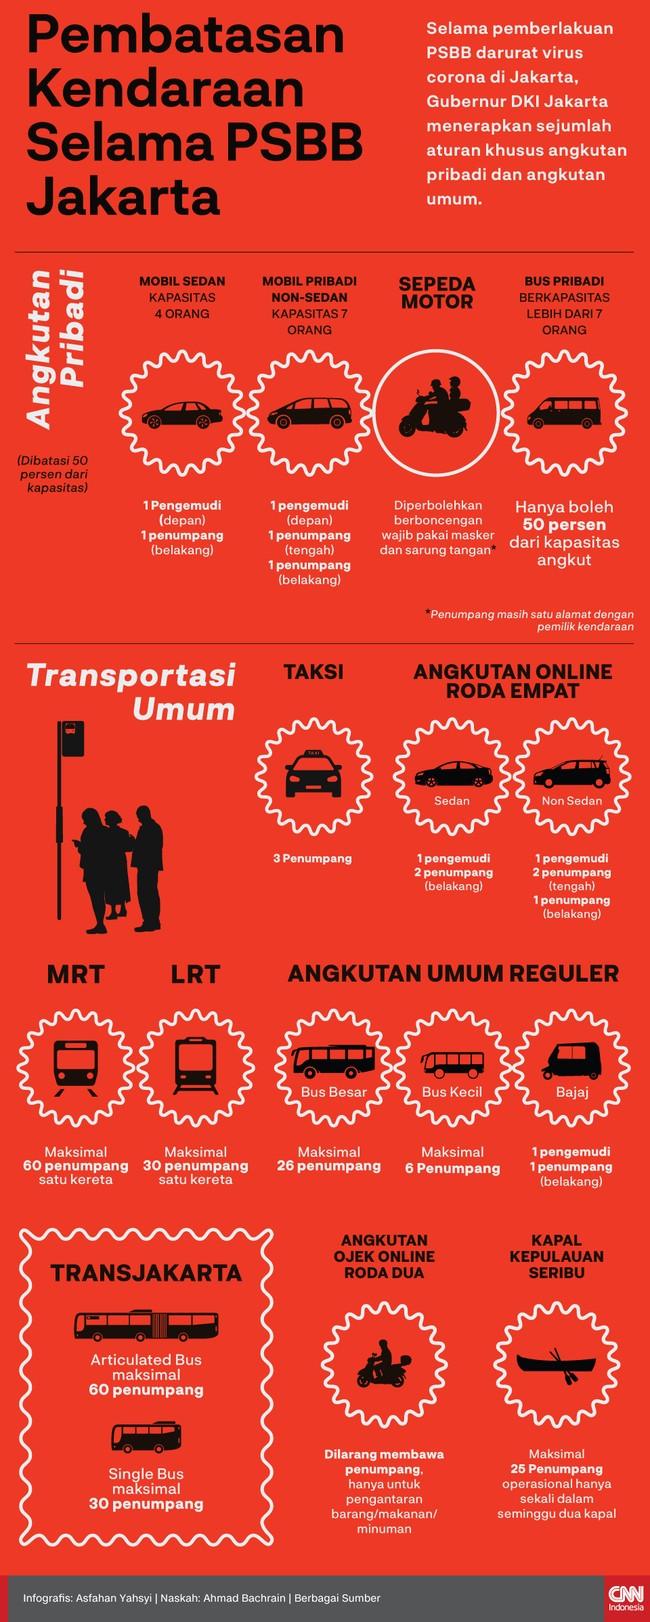 Infografis Pembatasan Kendaraan Selama Psbb Di Jakarta